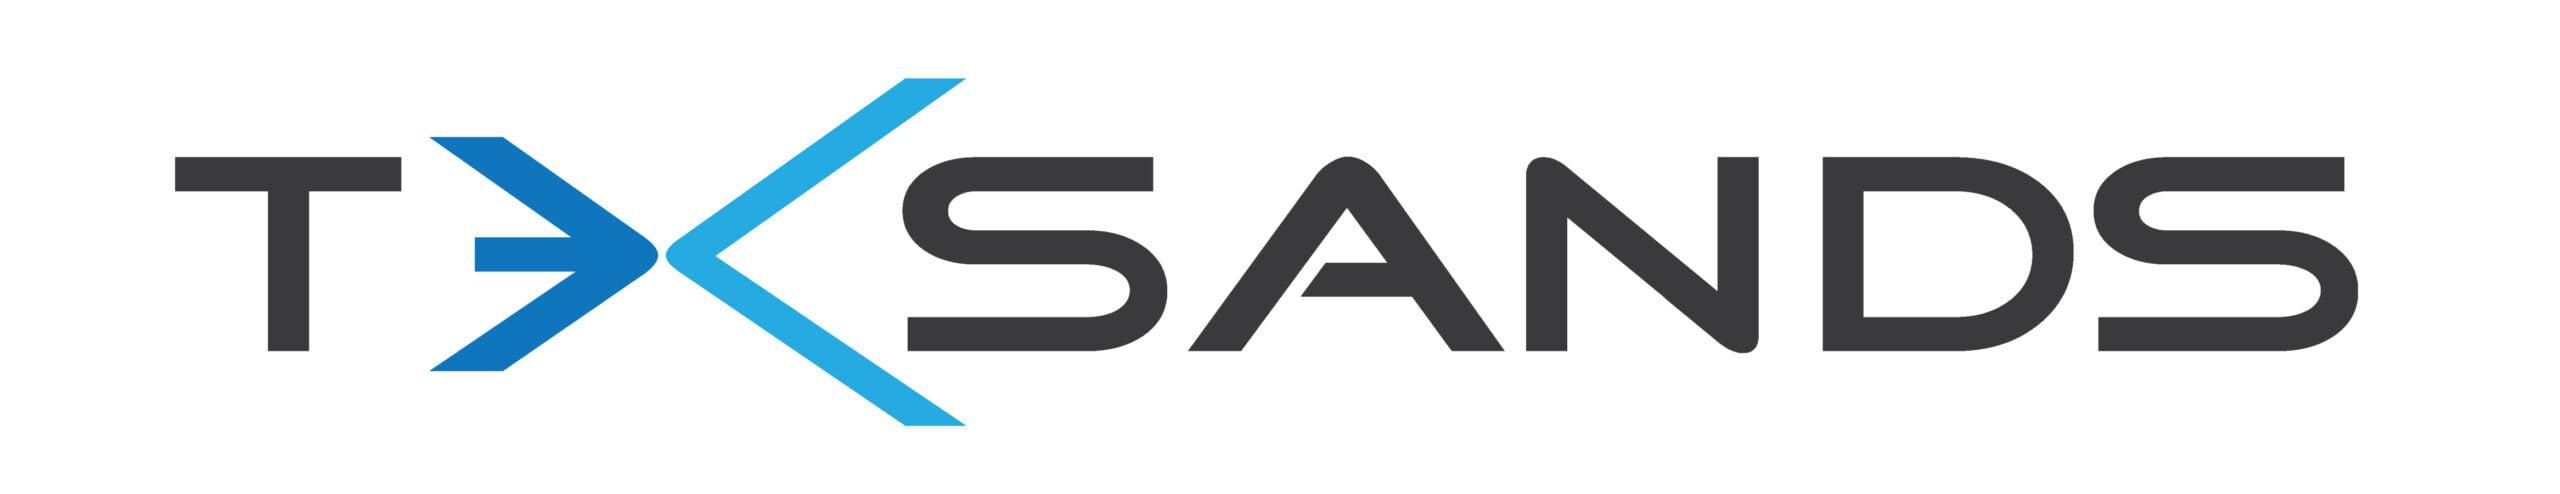 Teksands Logo